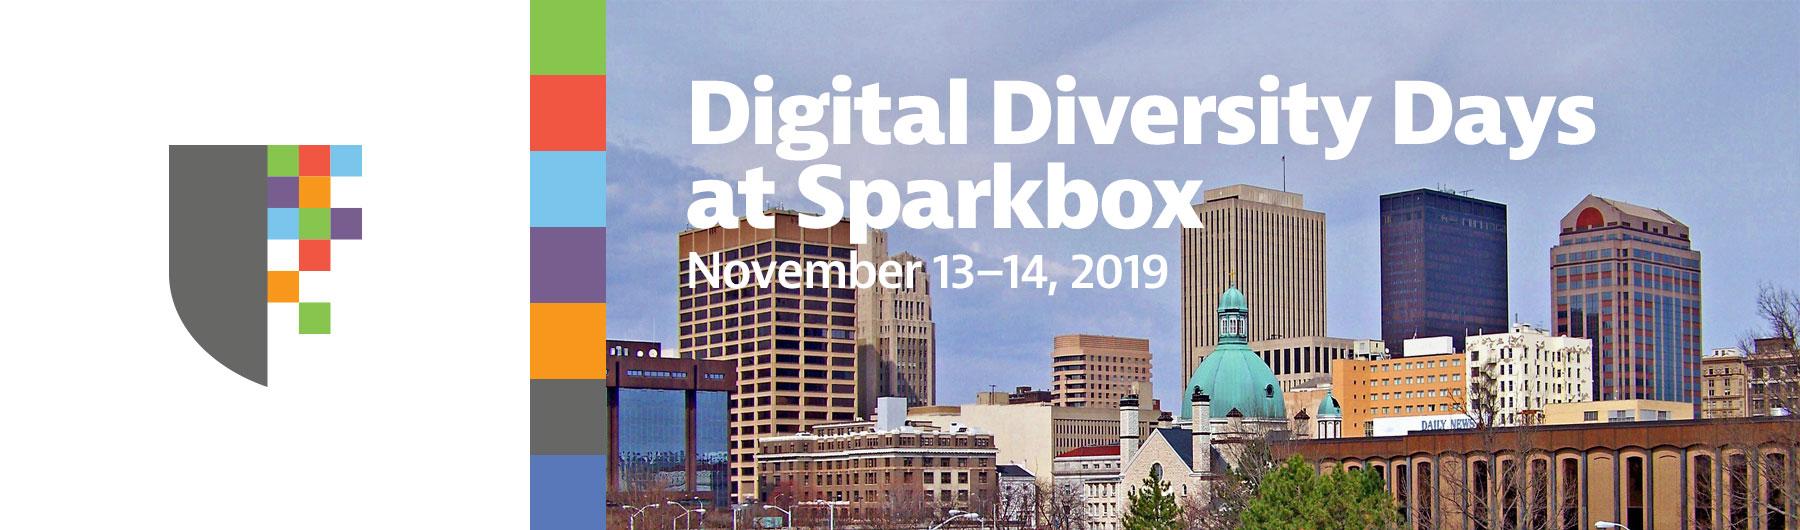 digital_diversity_days-tito-rect.jpg